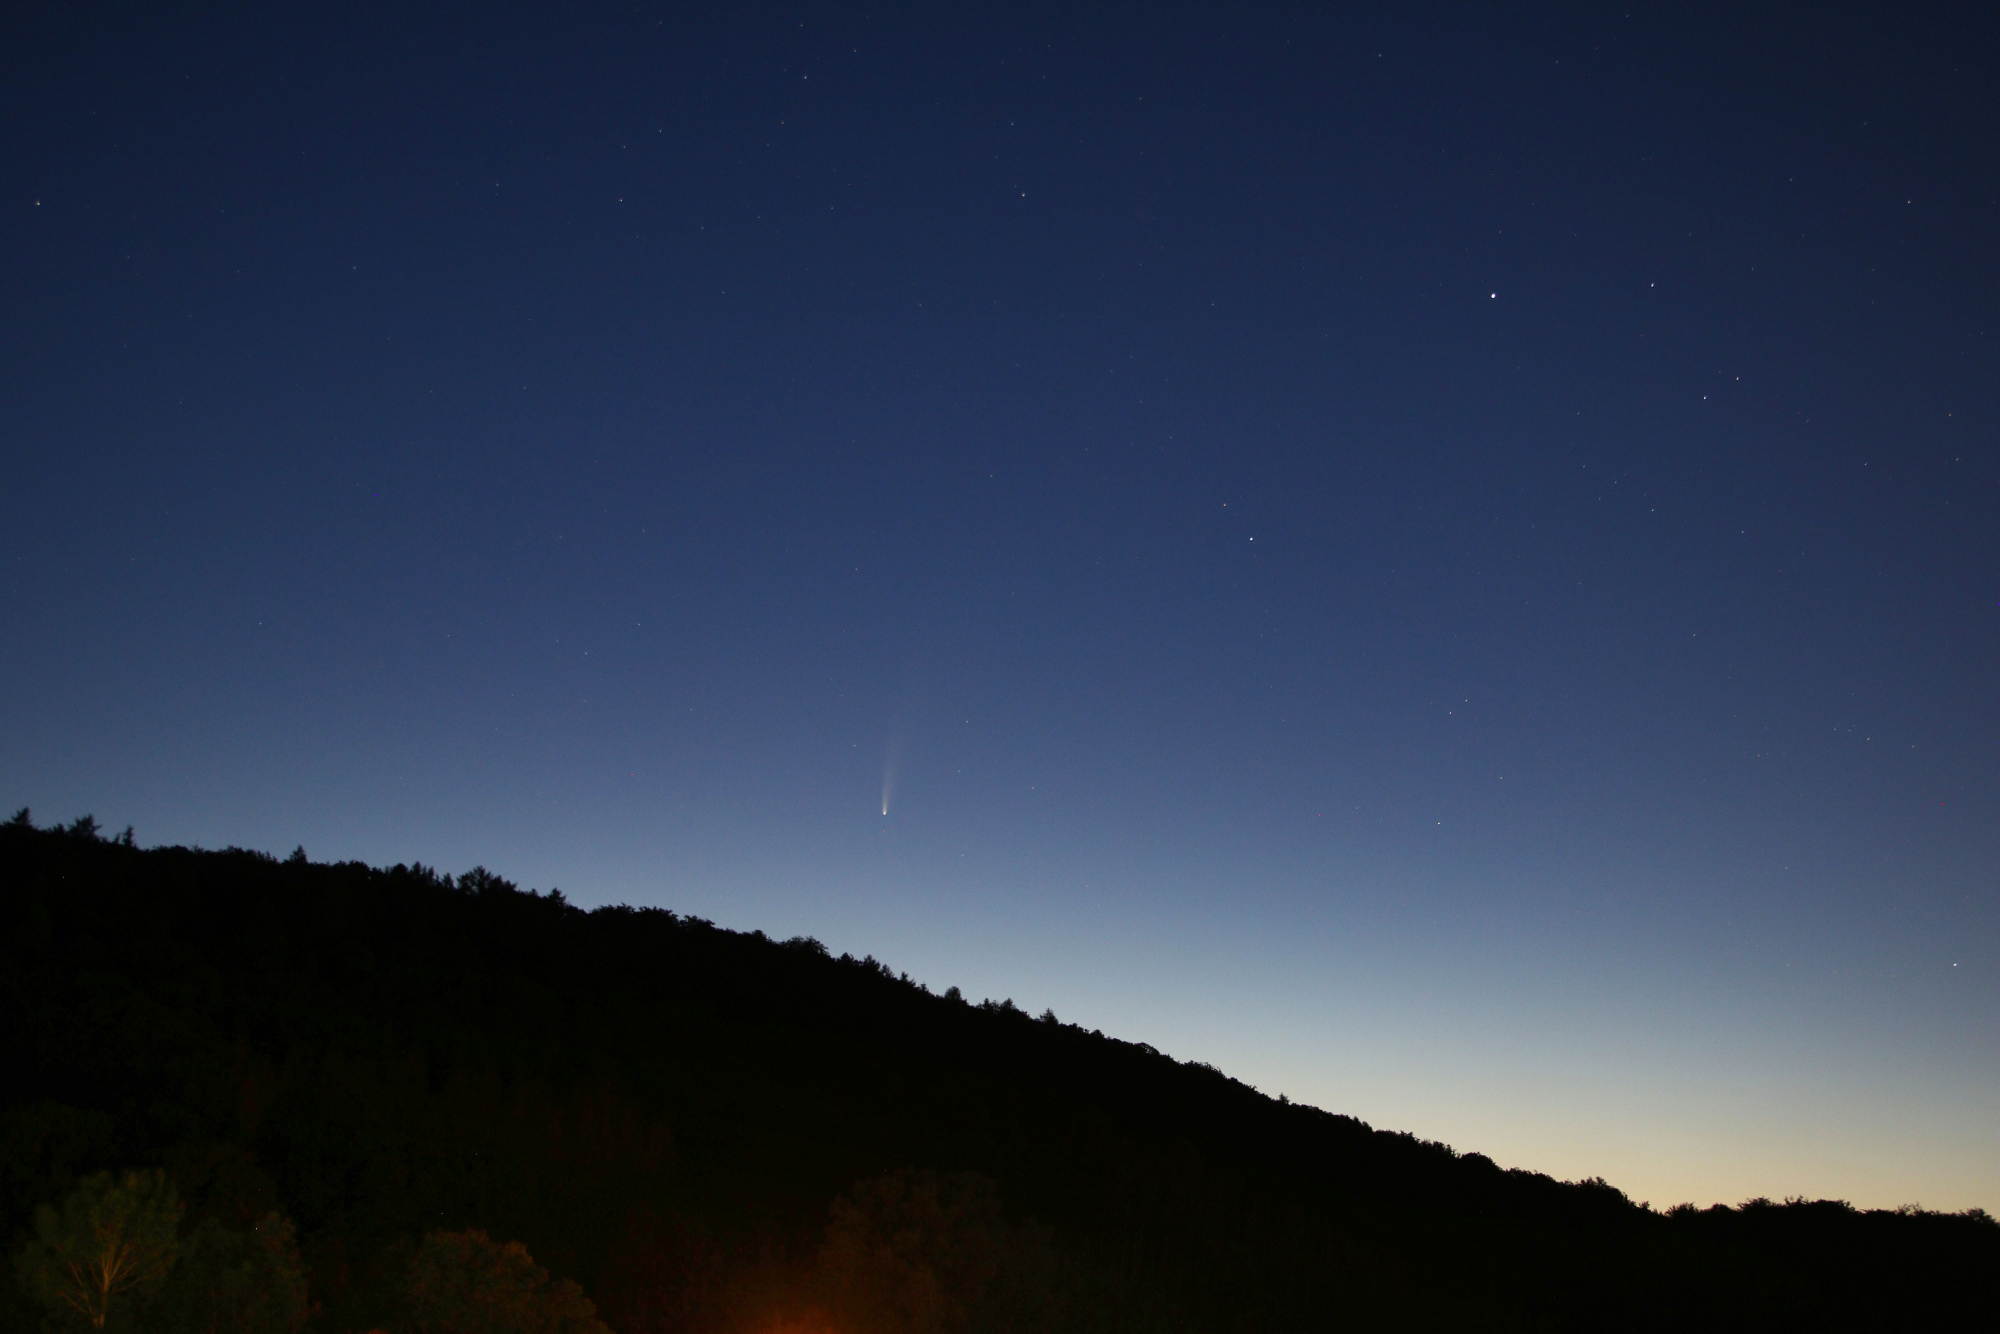 5f0baced082c1_NEOWISE6903B1send.thumb.jpg.77476525cd420d576d5efaa49c938c81.jpg